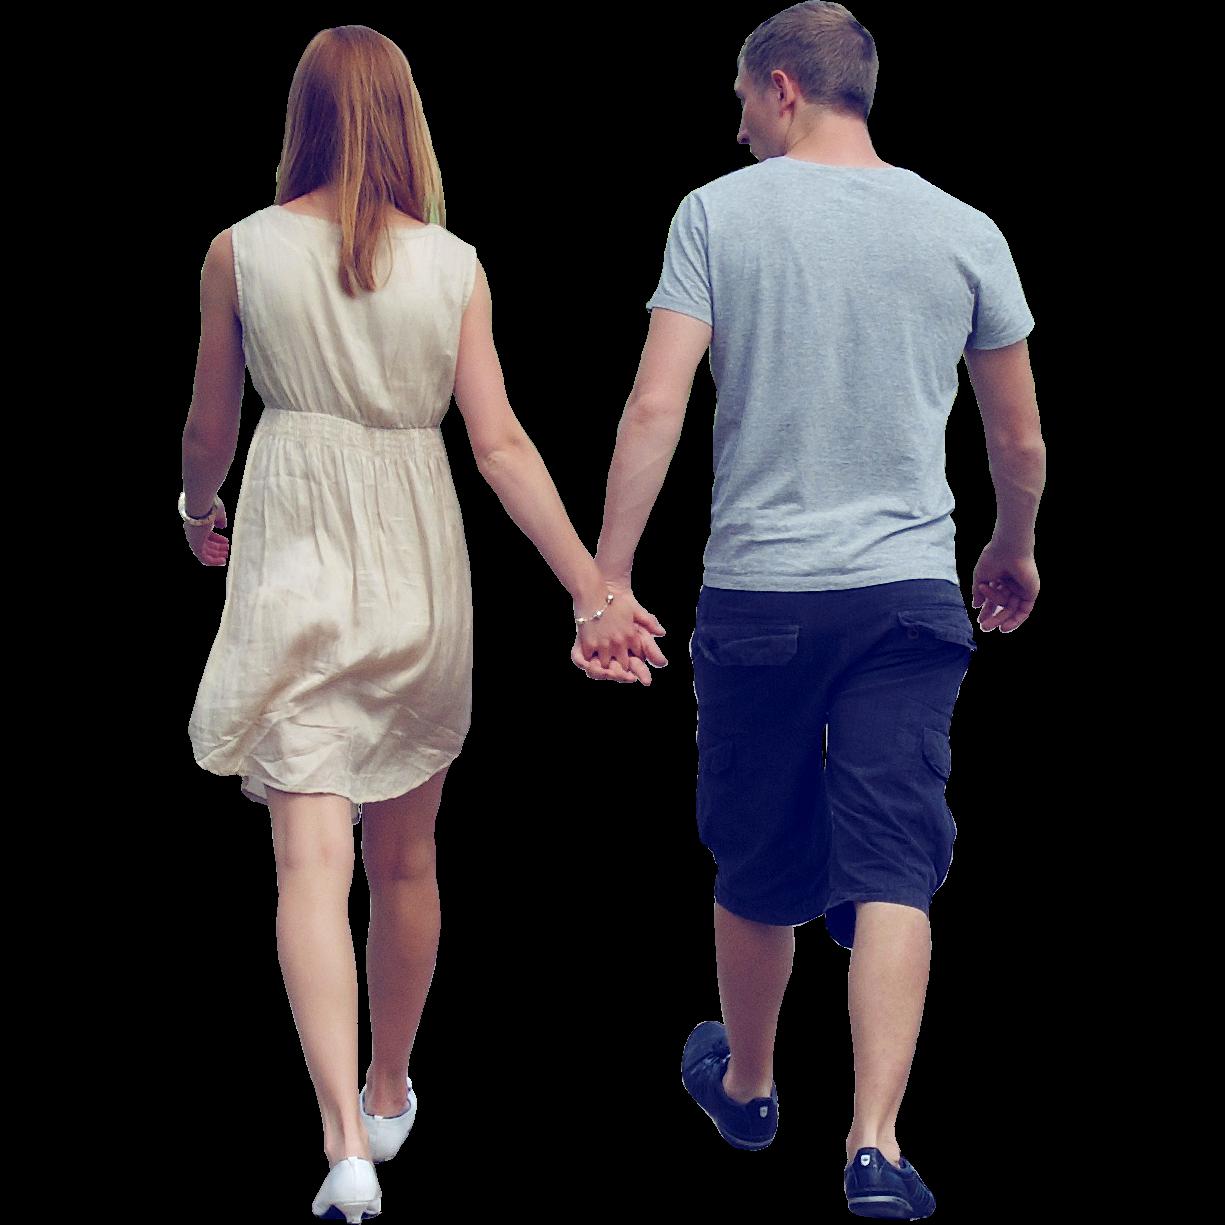 Couple Transparent PNG Image